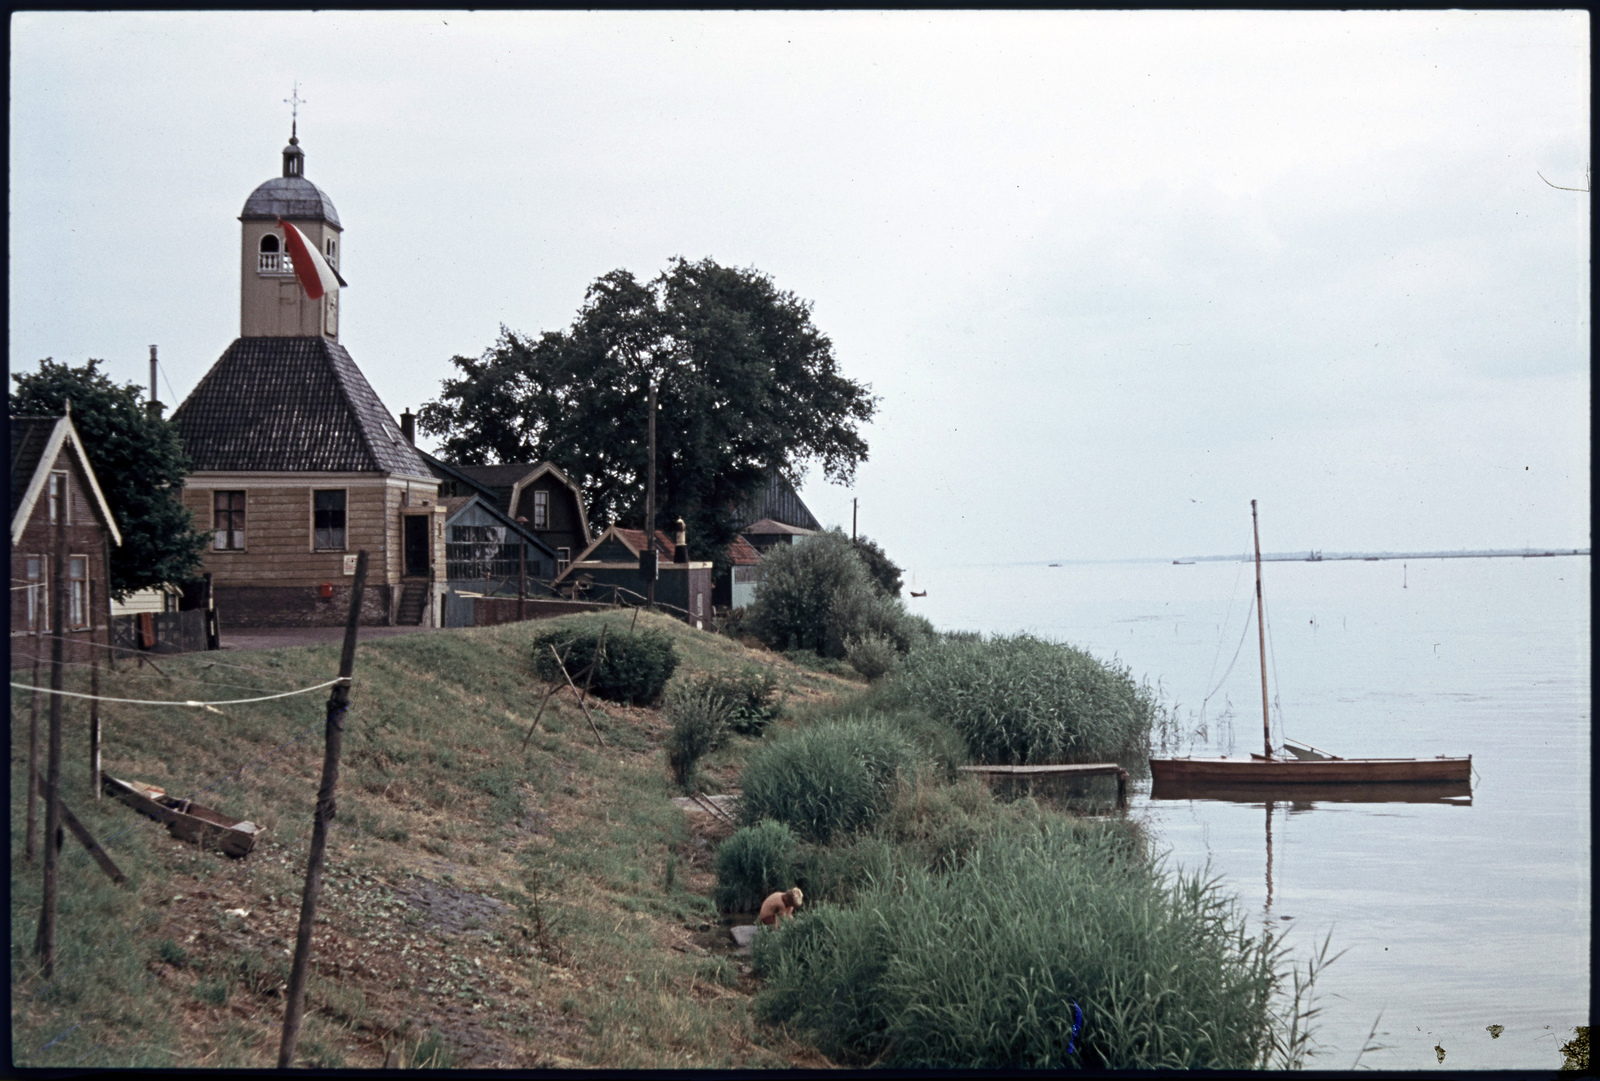 Raadhuisje van Durgerdam